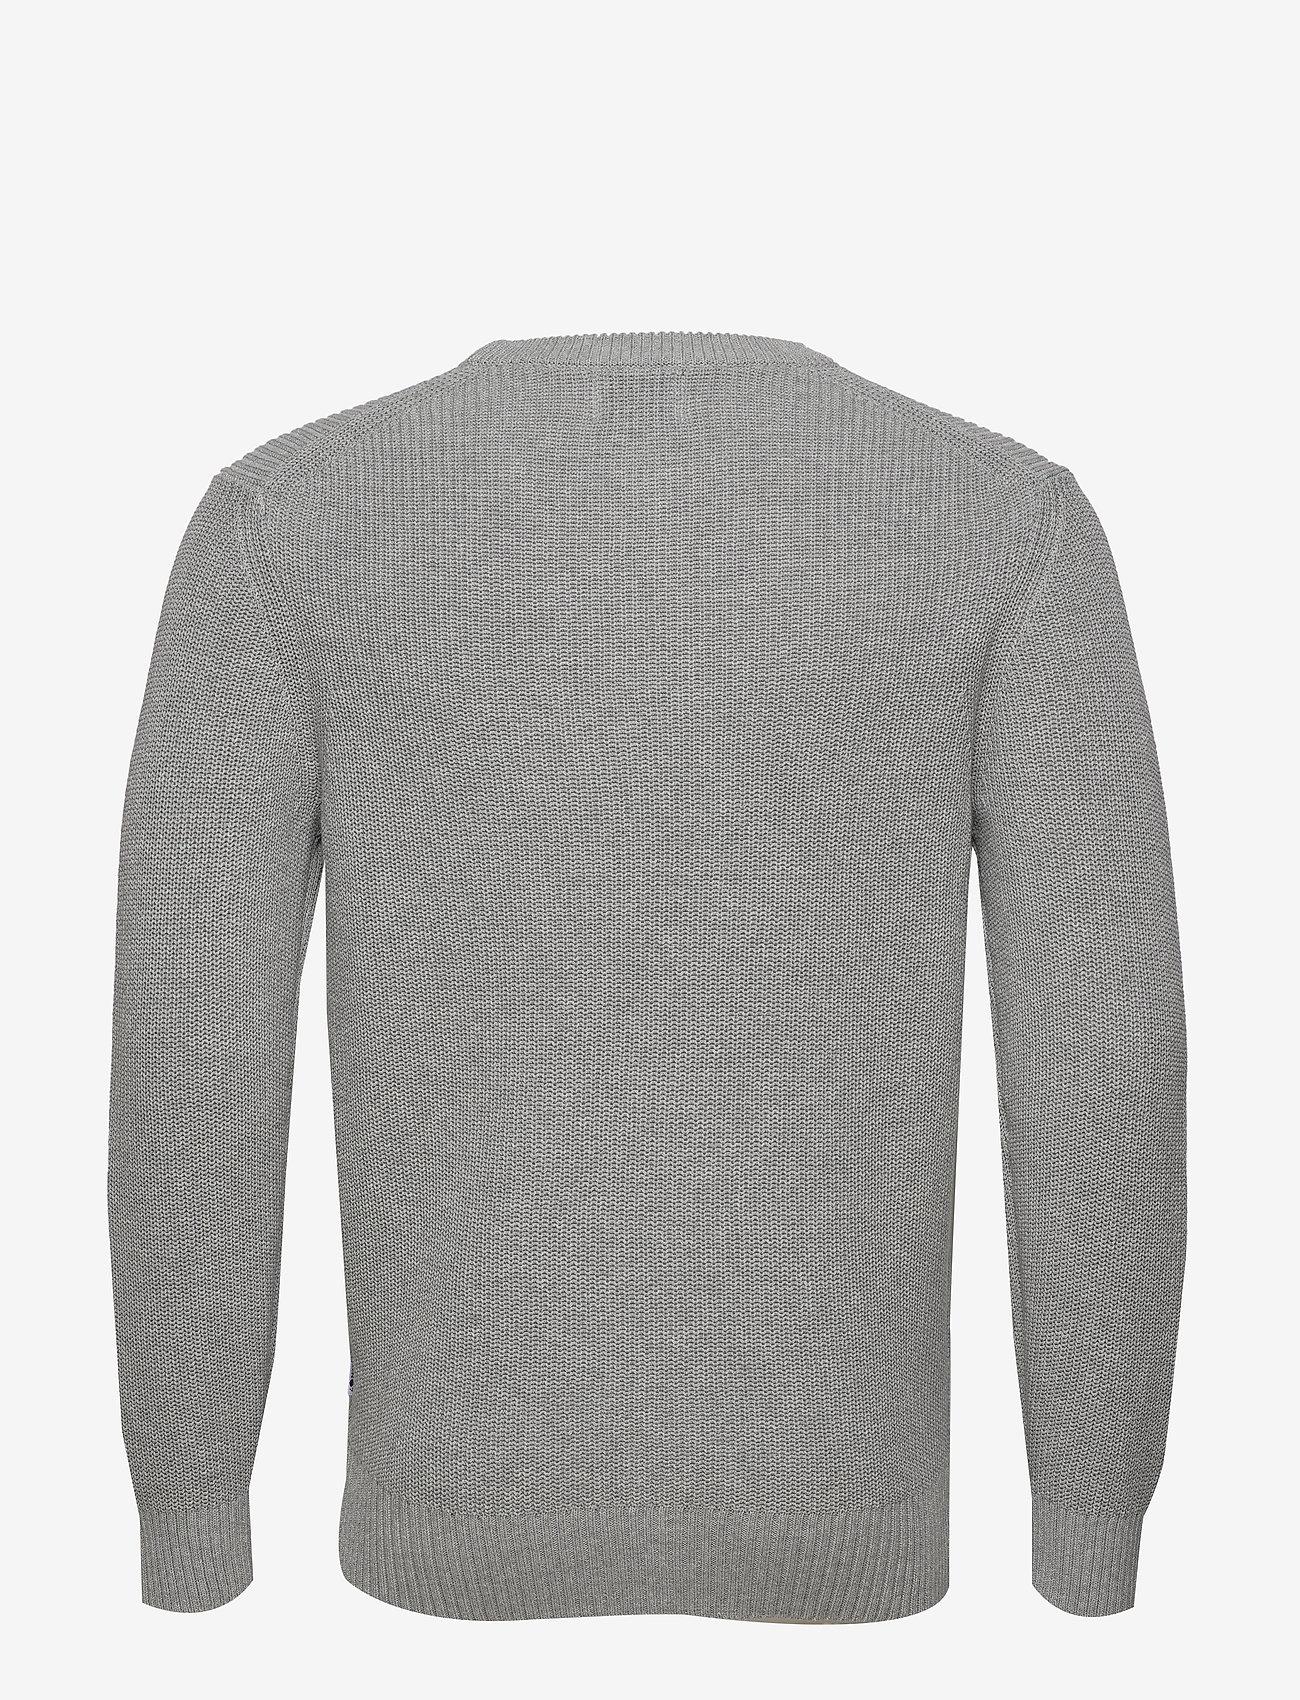 NN07 - Knut 6376 - tricots basiques - medium grey melange - 1